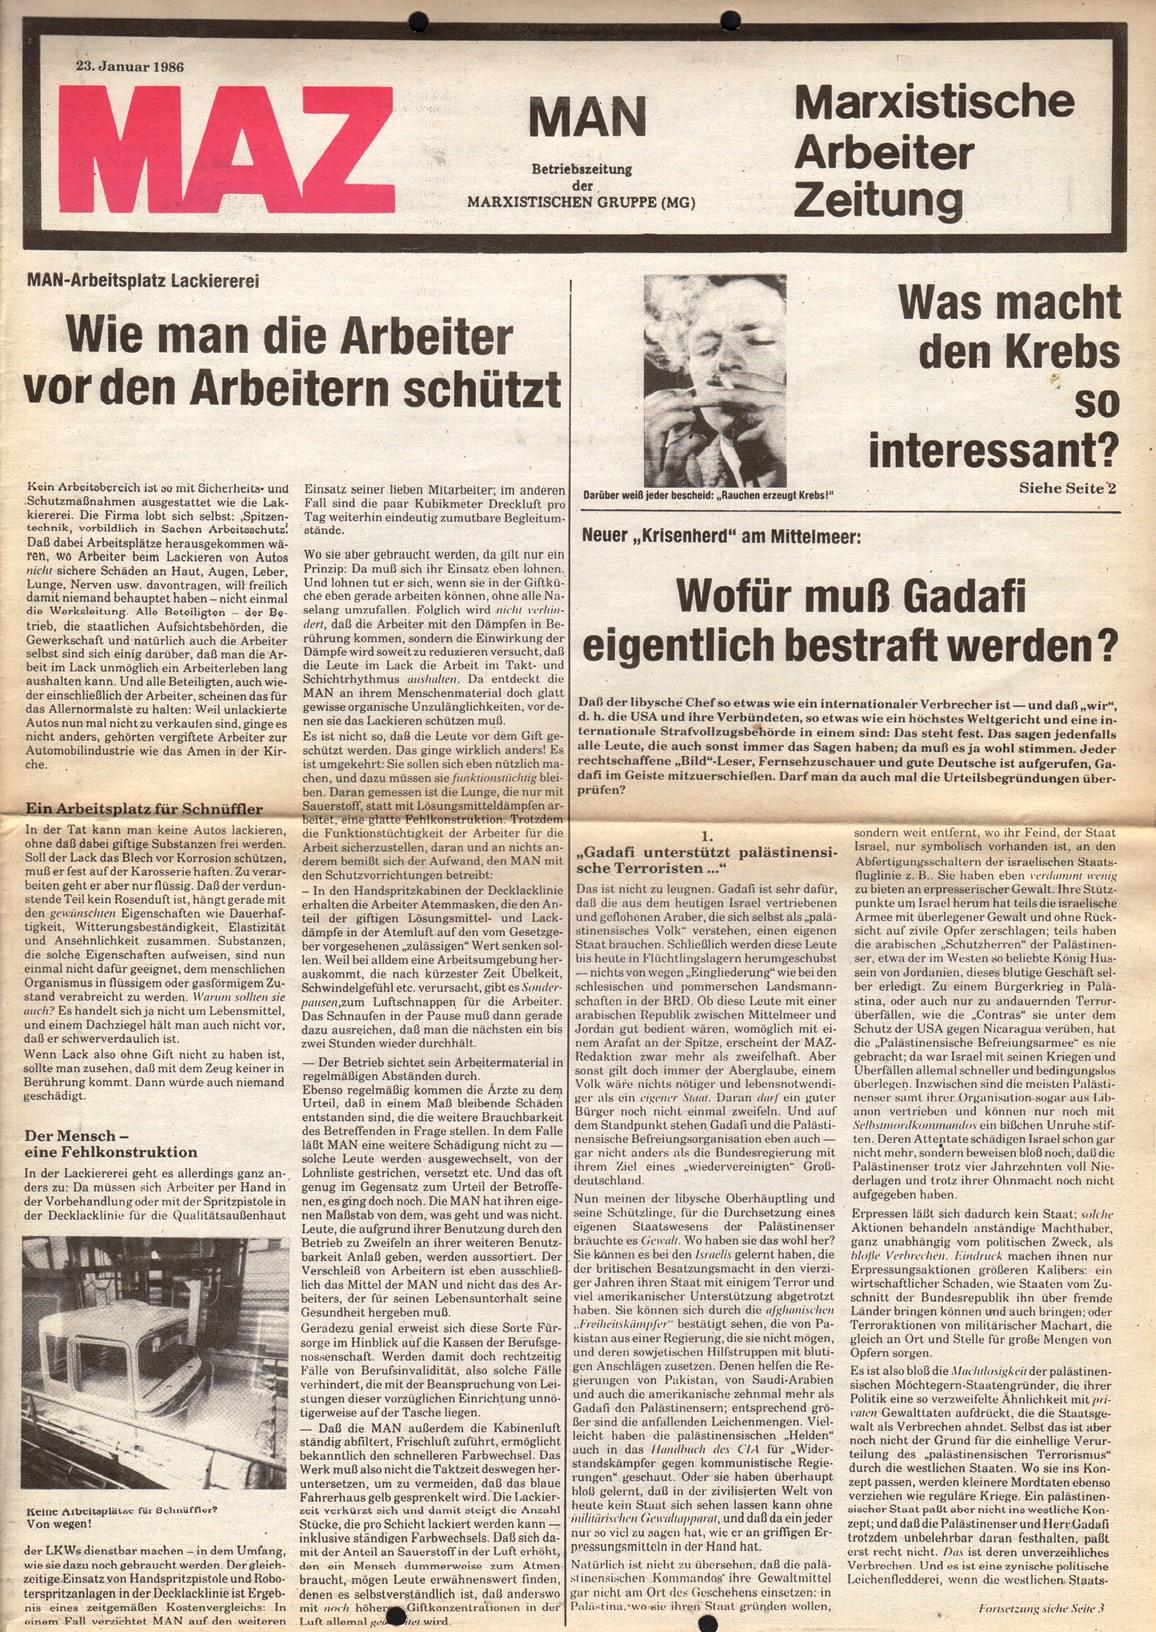 Muenchen_MG_MAZ_MAN_19860123_01